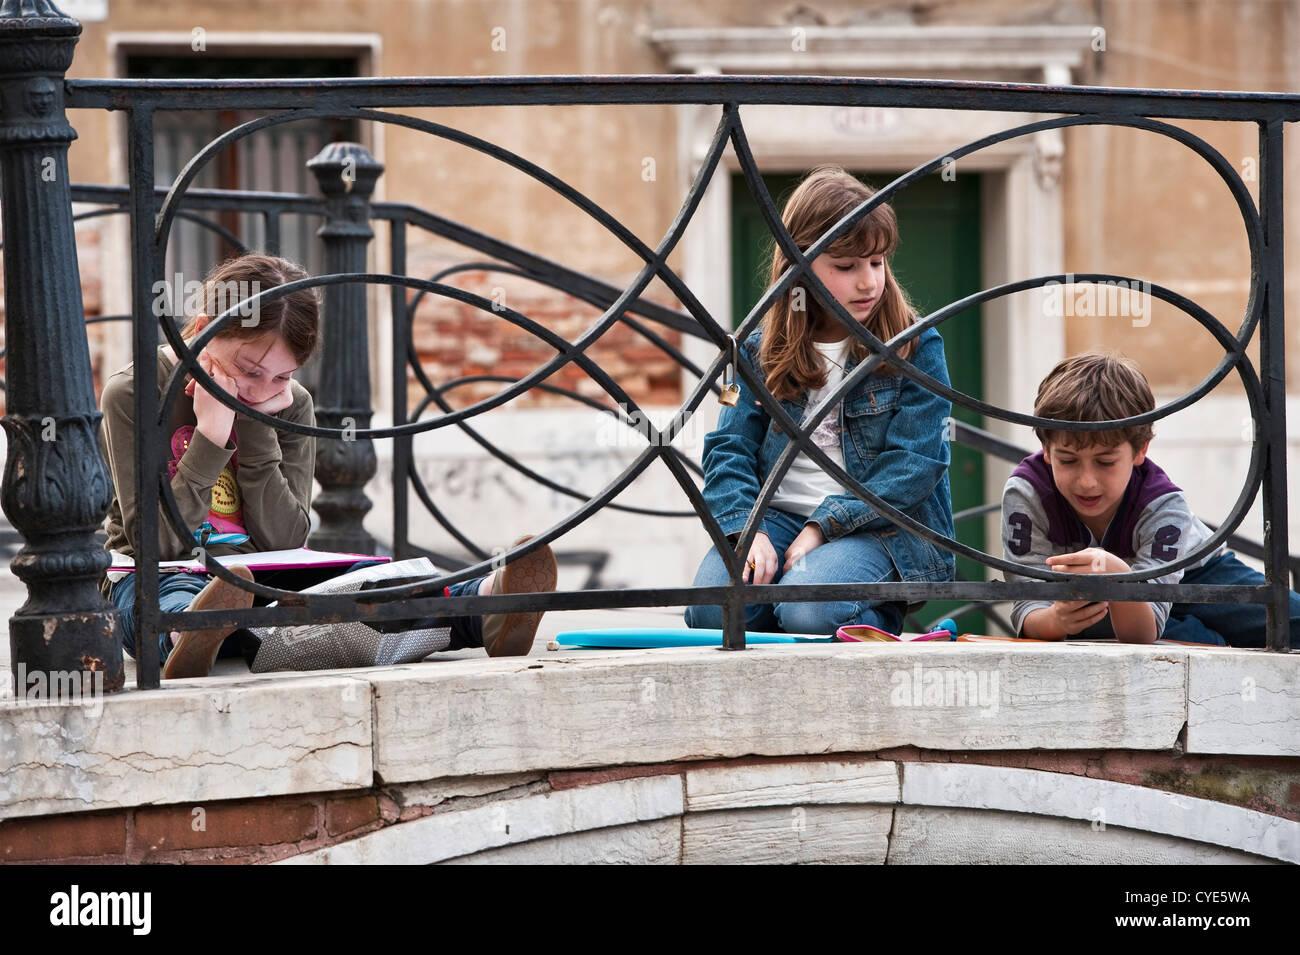 Venice, Italy. Three Italian schoolchildren on a bridge over a canal - Stock Image